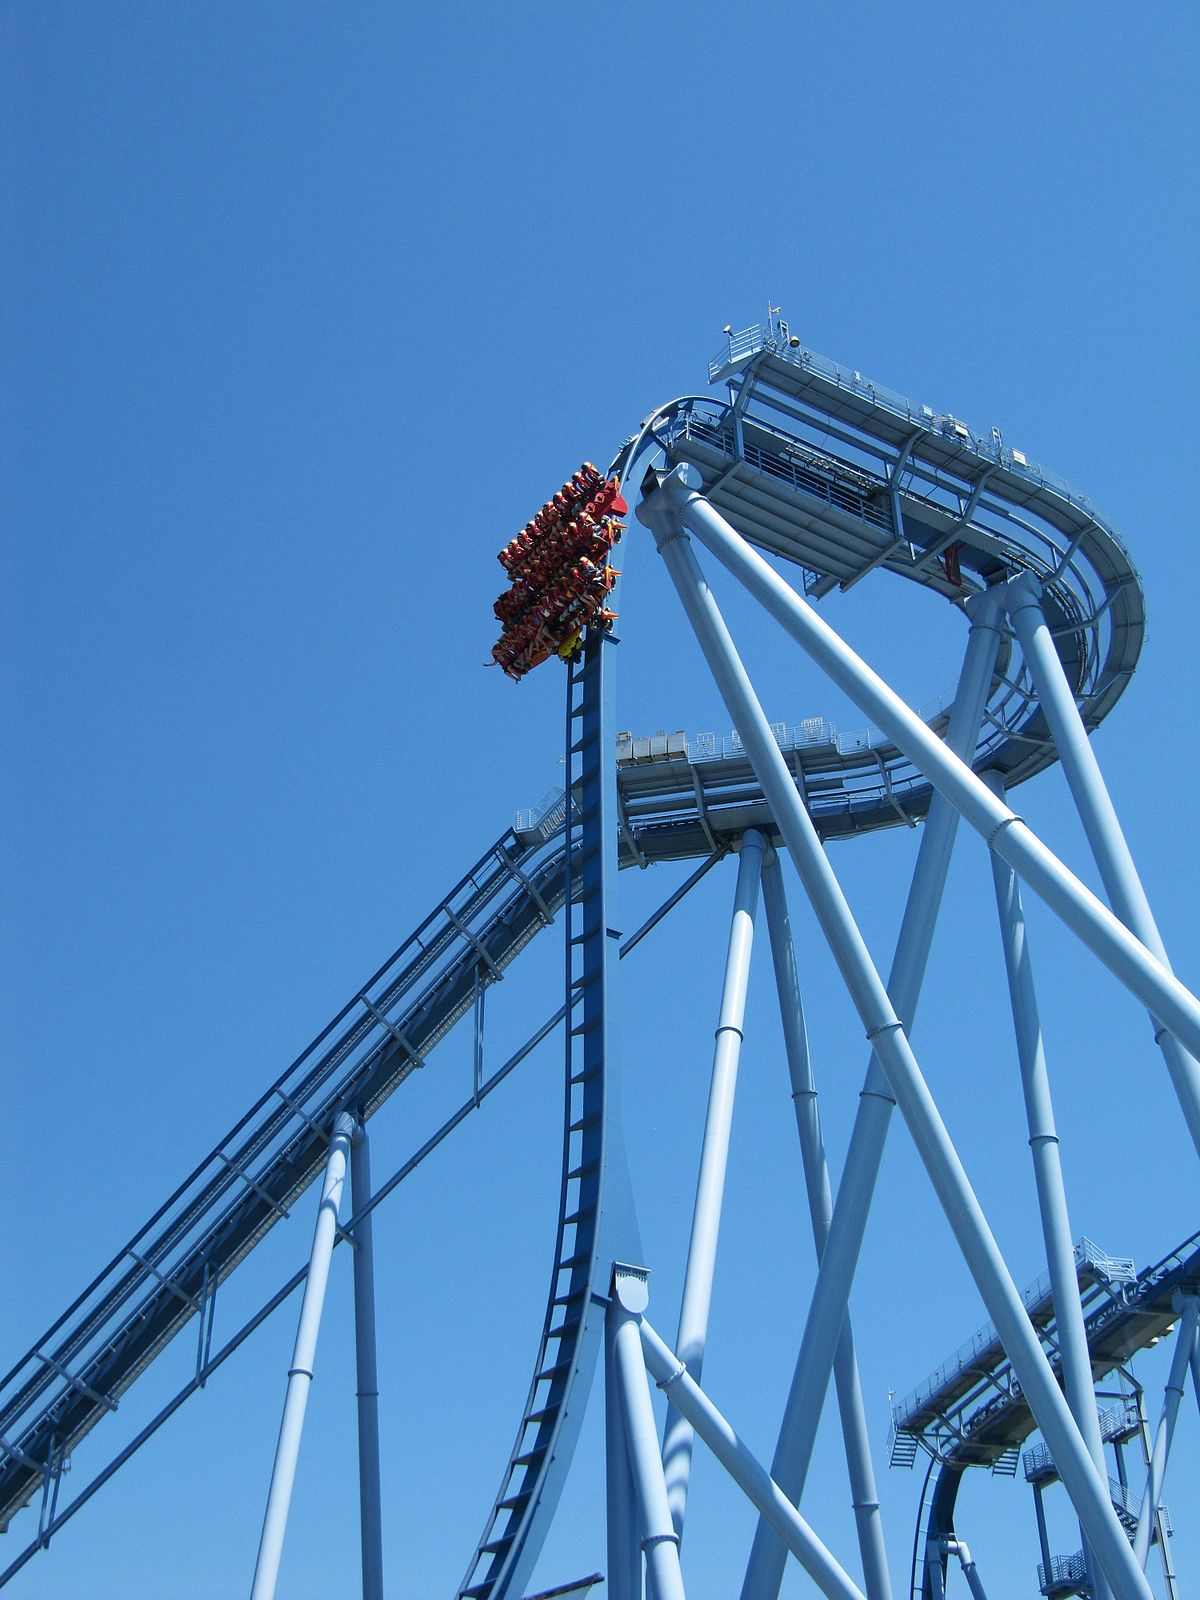 Griffon roller coaster wikipedia - Roller coasters at busch gardens ...